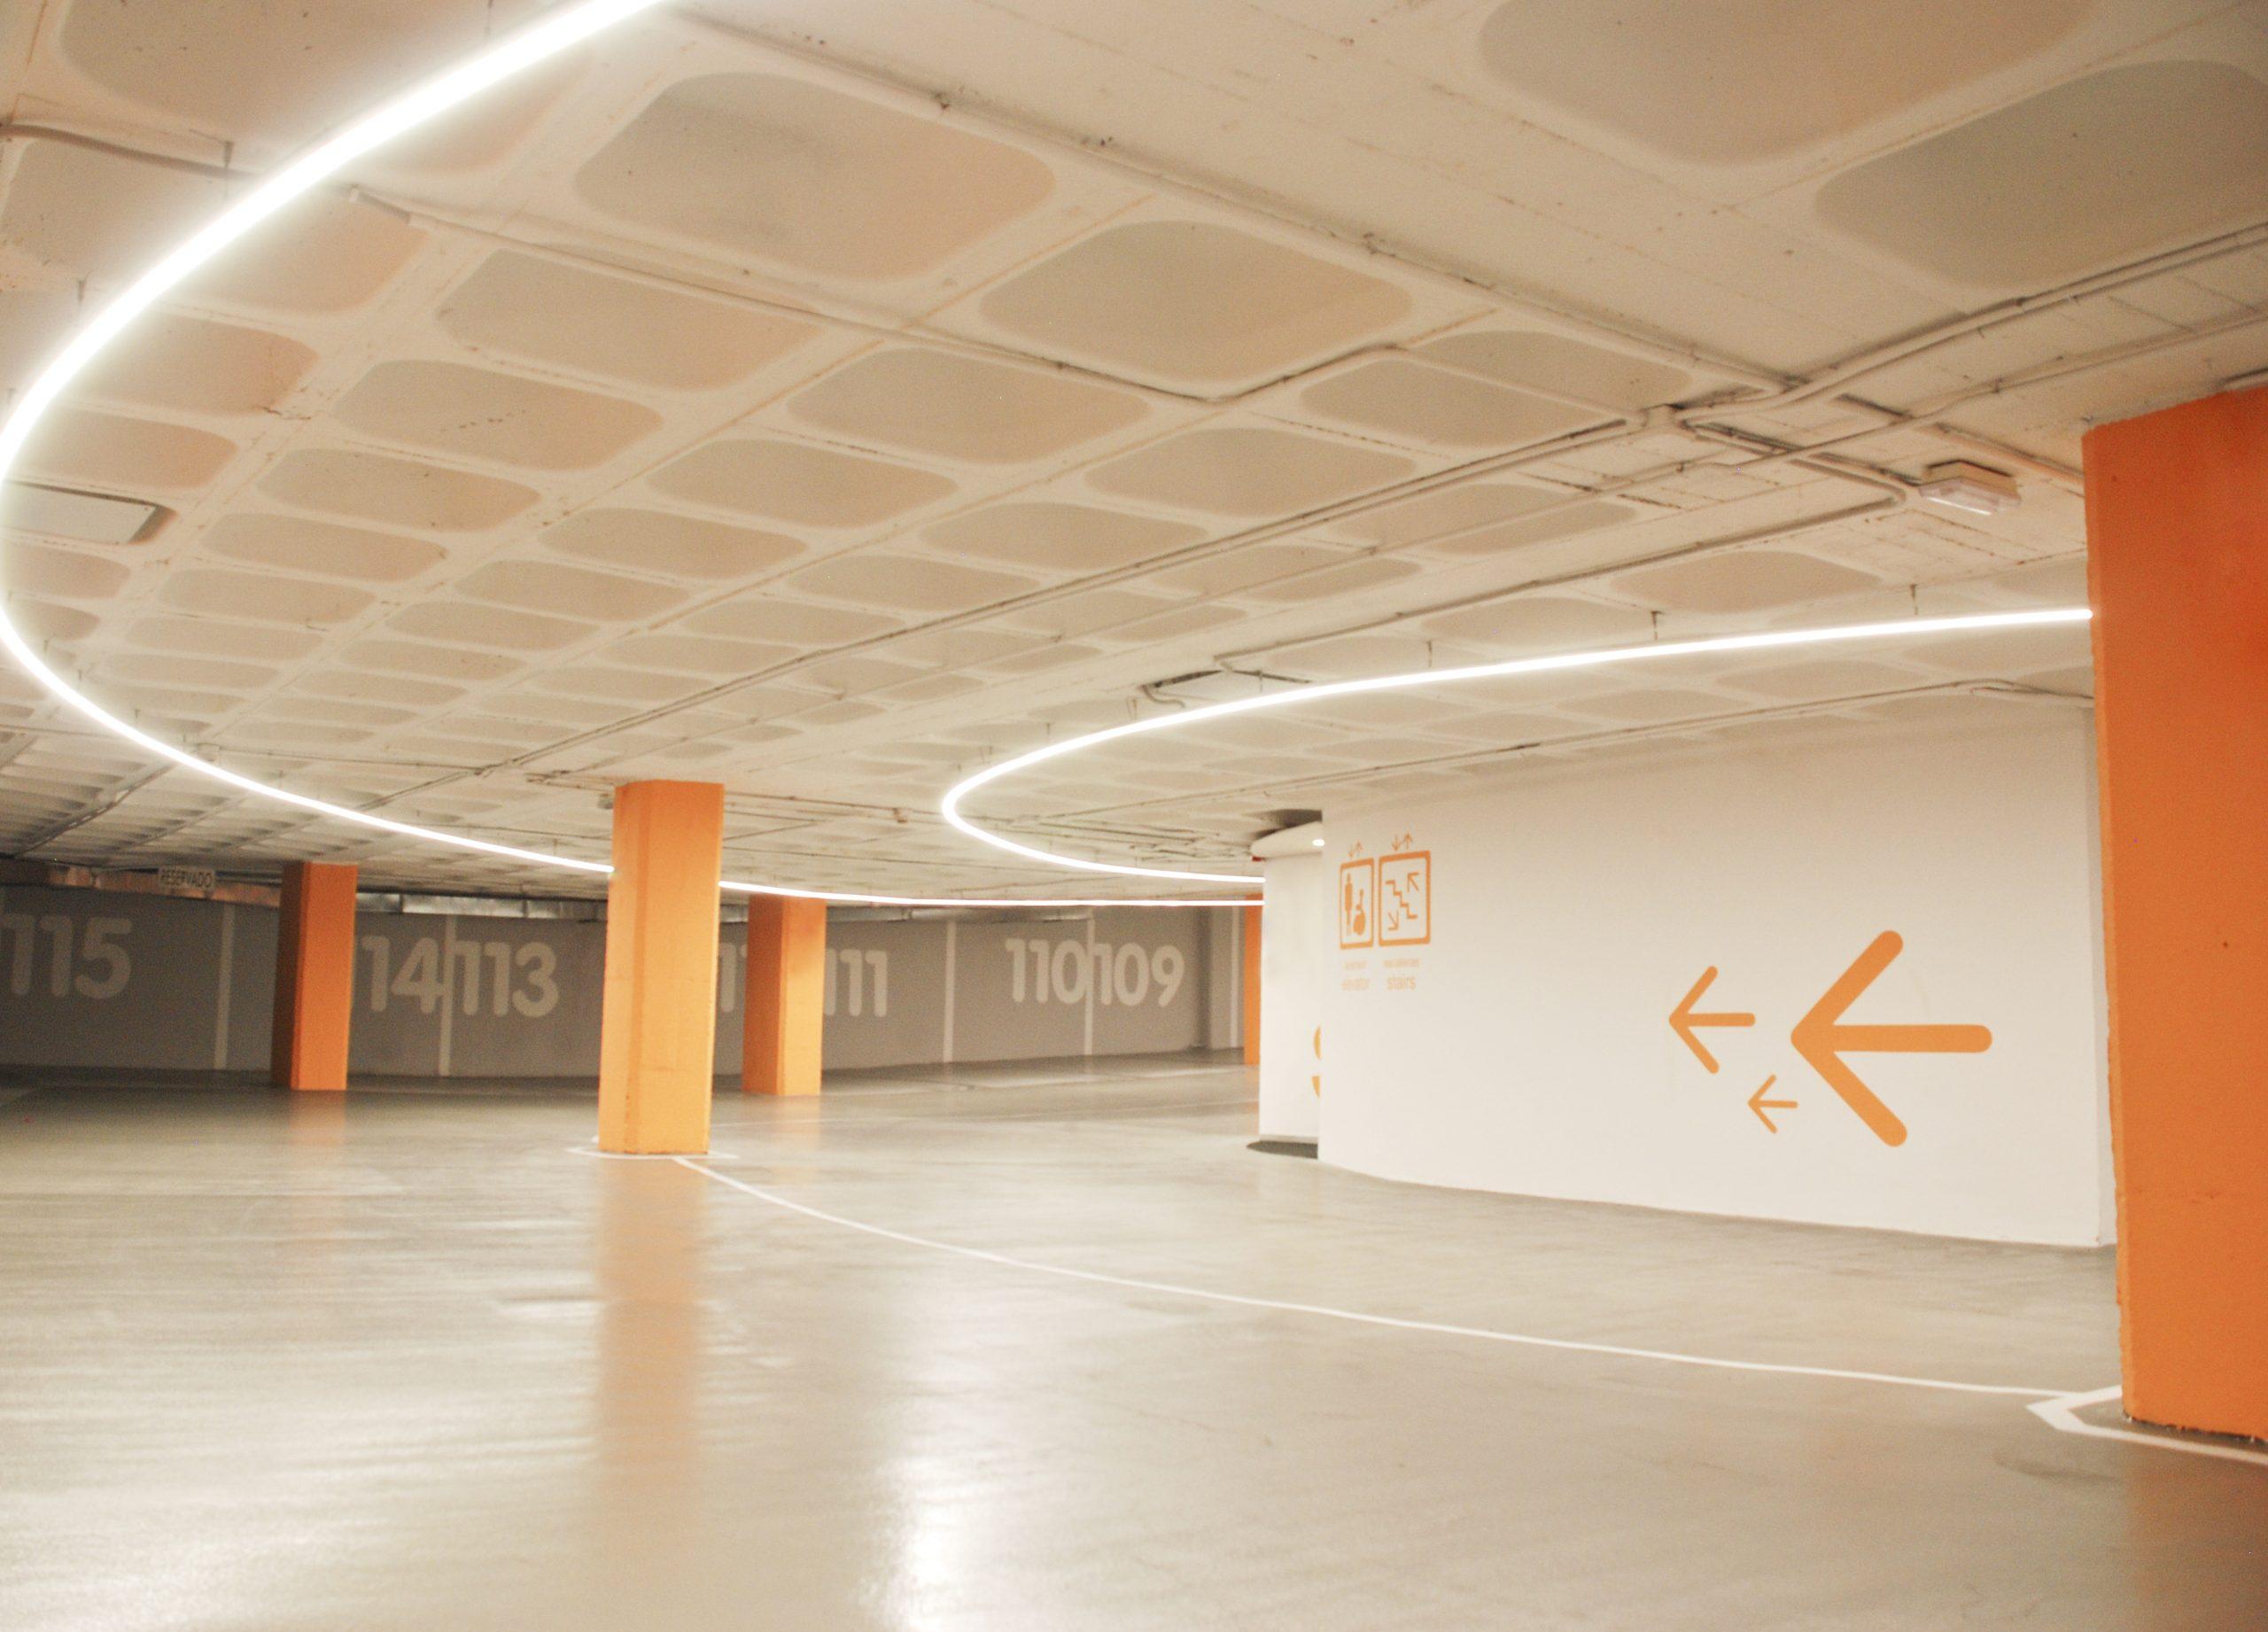 diseno_parking_arquitectura_corporativa_iluminacion_led_rampa_noviembre_estudio